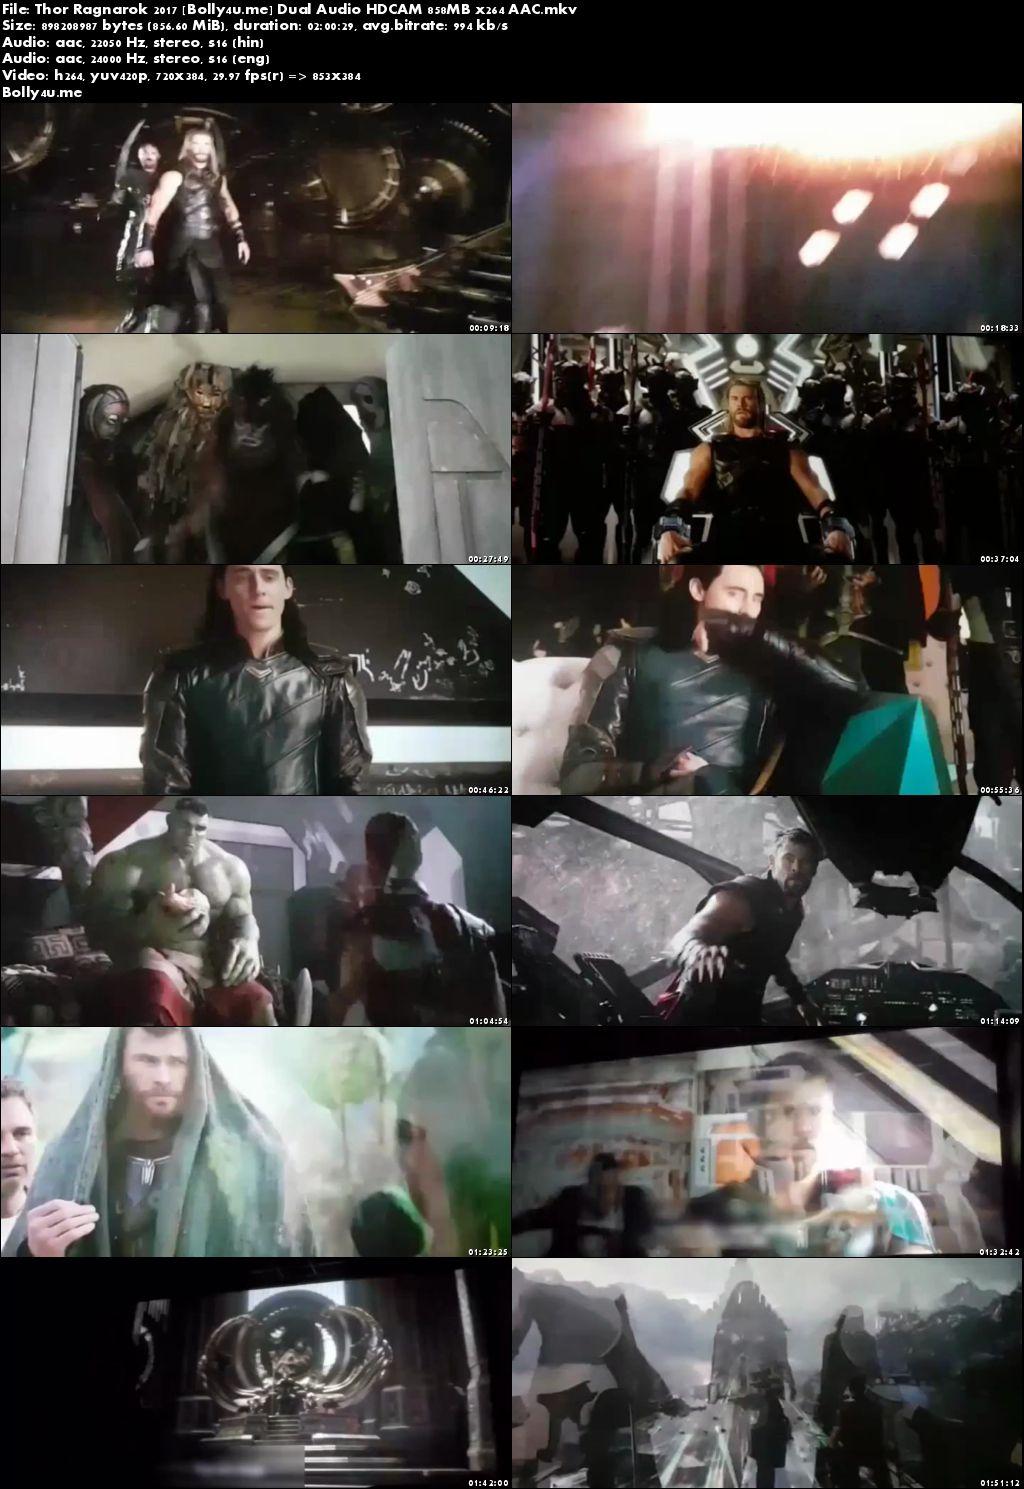 Thor Ragnarok 2017 HDCAM 400Mb Hindi Dubbed Dual Audio 480p Download